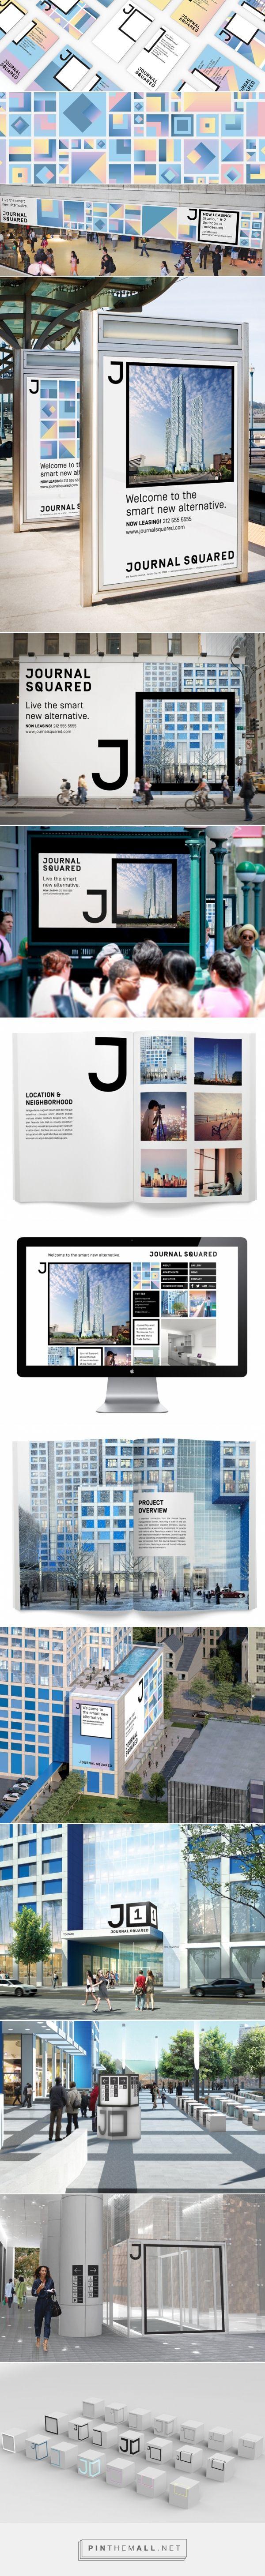 Bruce Mau Design | Journal Squared | Work - created via http://pinthemall.net